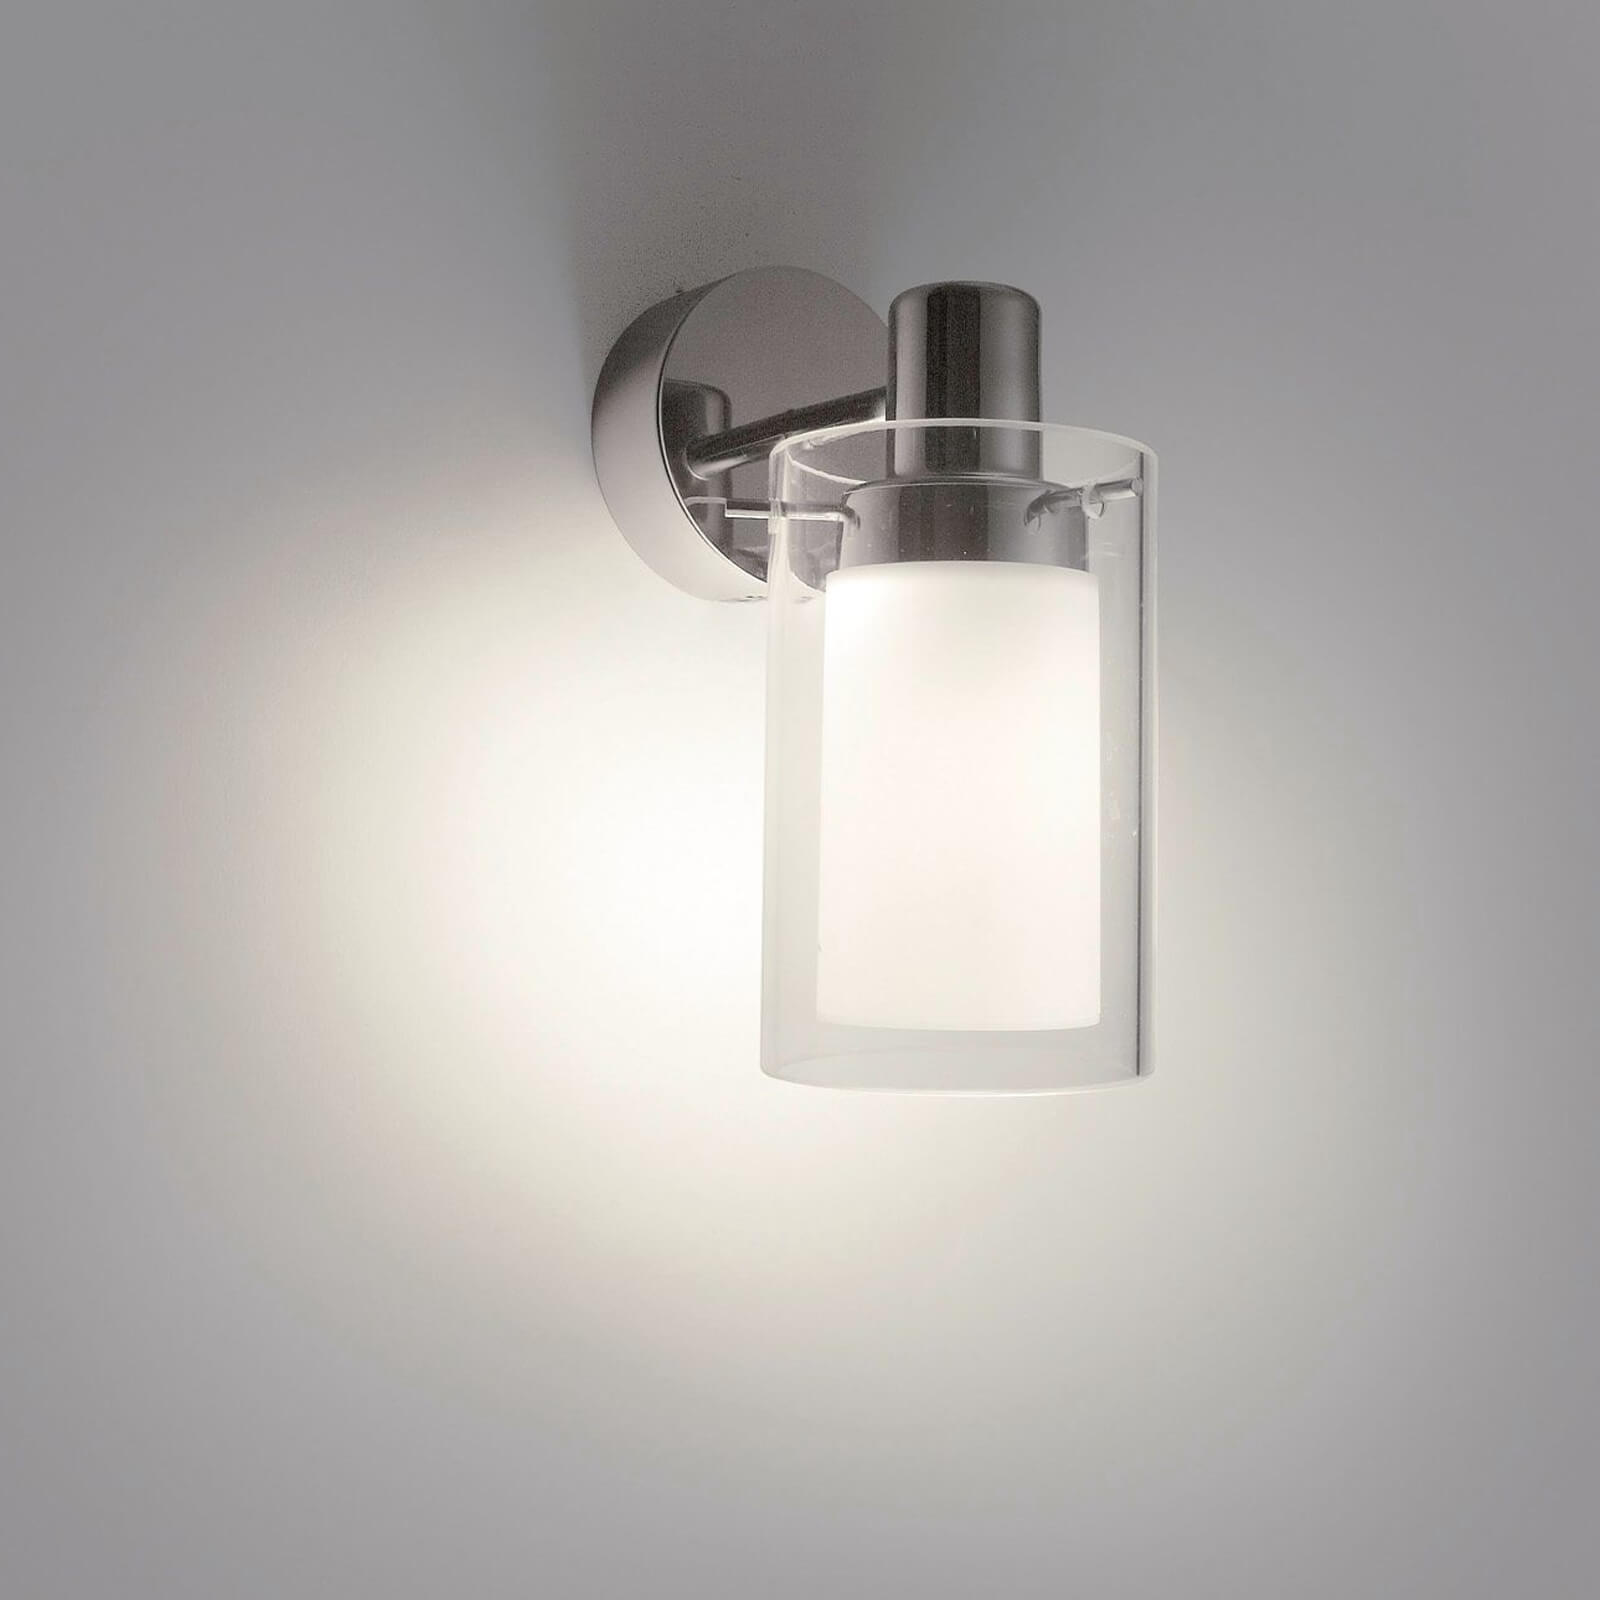 philips mybathroom care wandlamp chroom 1 lamp. Black Bedroom Furniture Sets. Home Design Ideas